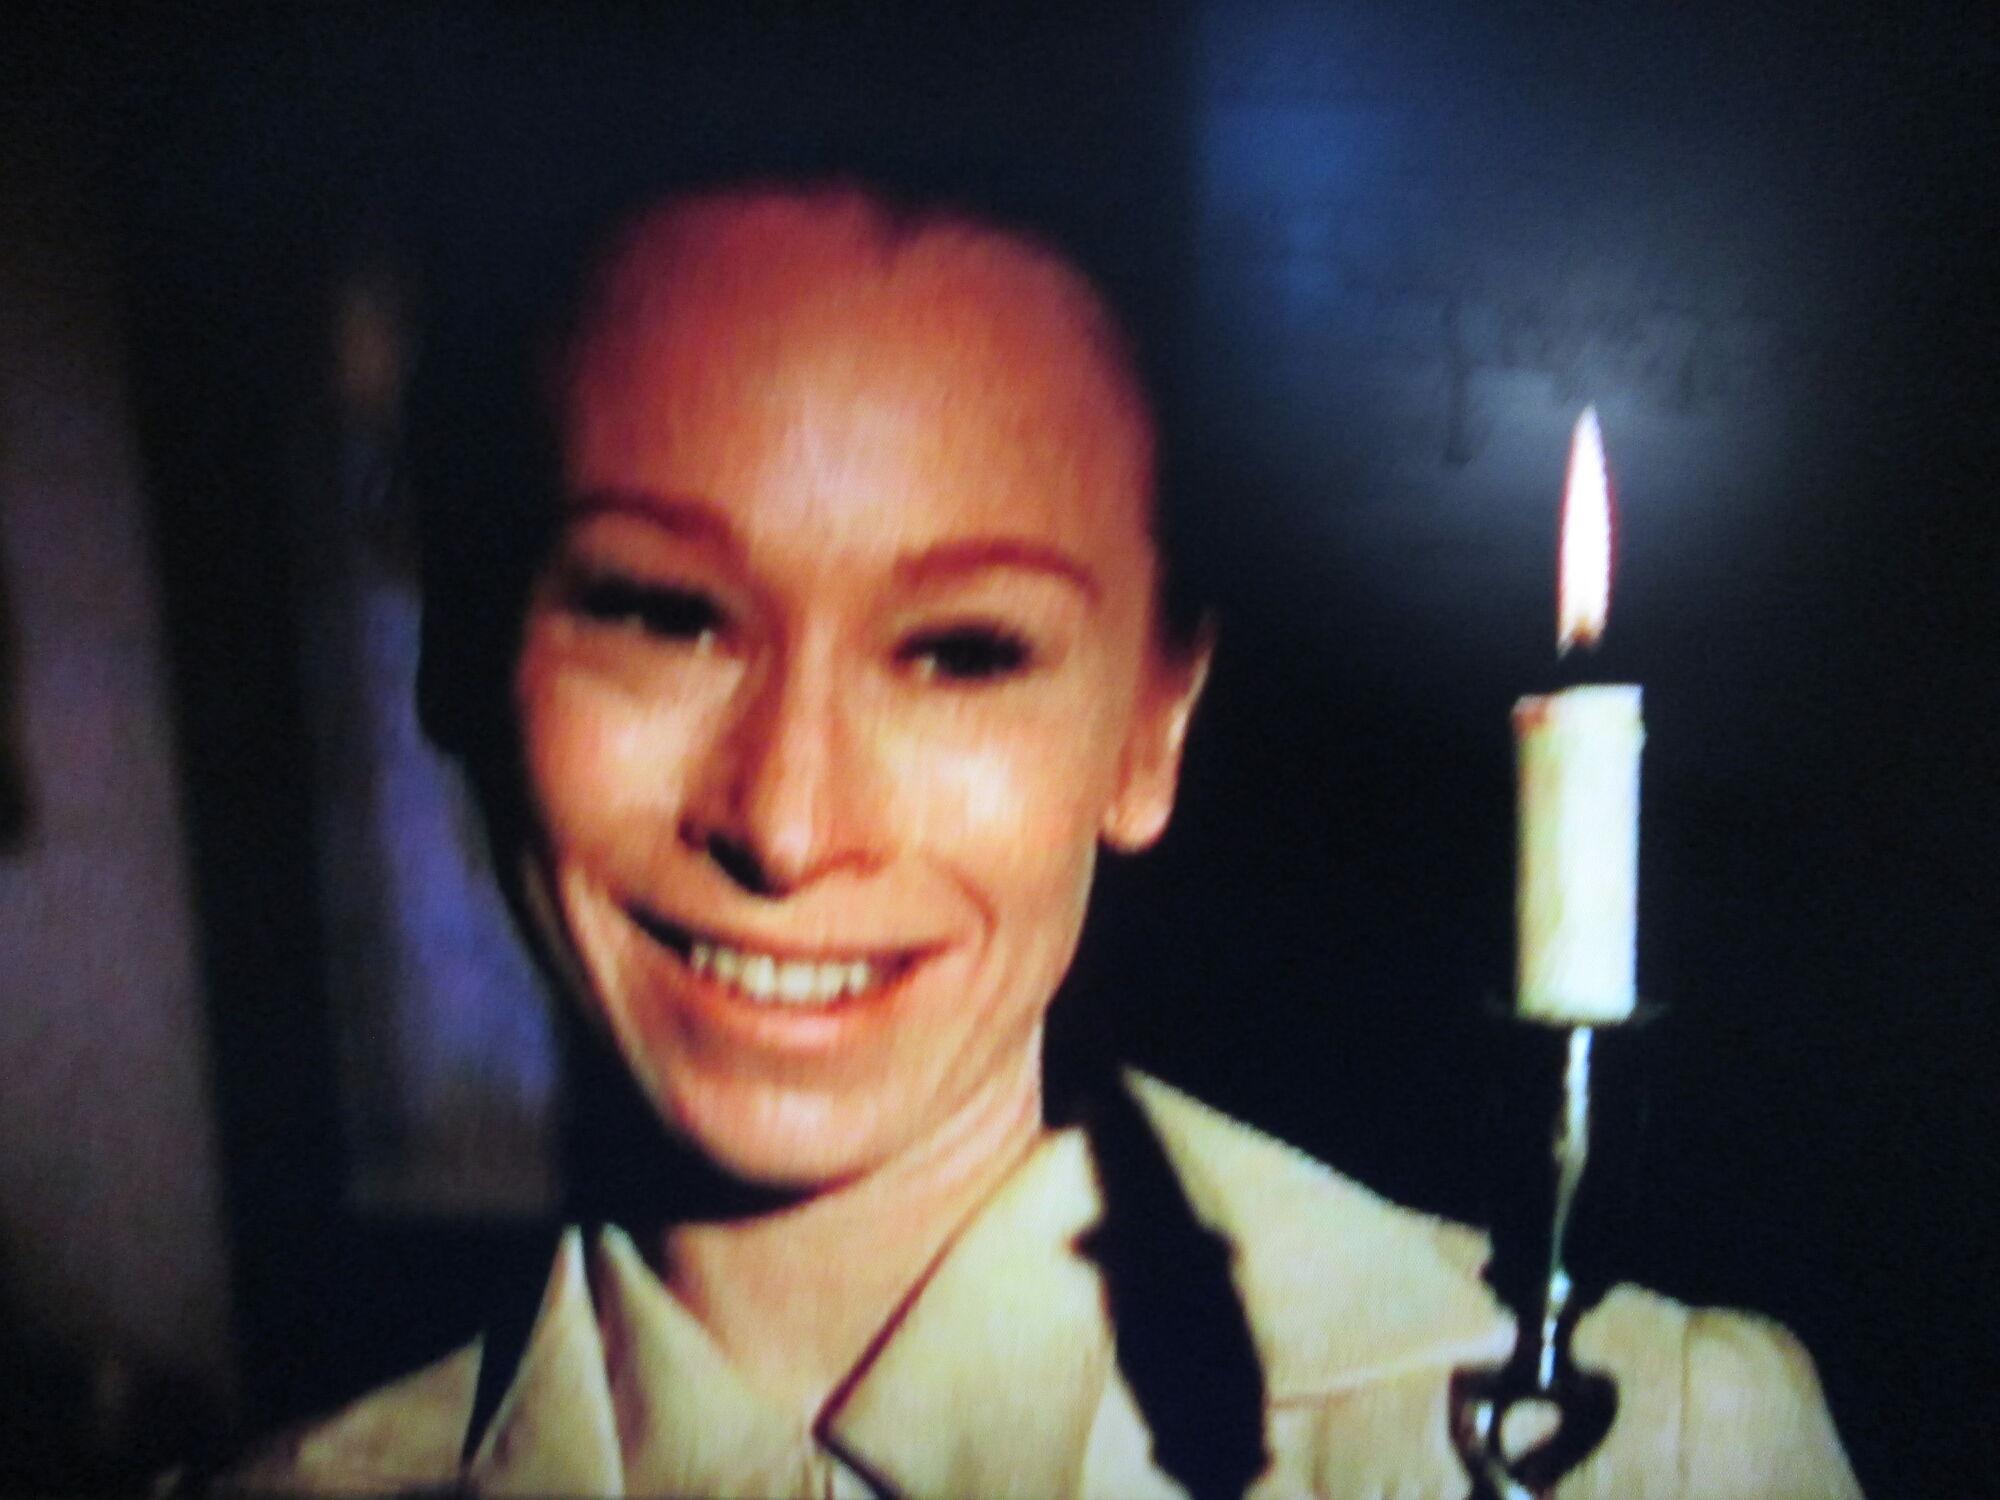 Ethel Merman,Irina Bondarenko RUS 1998 XXX videos Nikky Smedley,Haley Lu Richardson